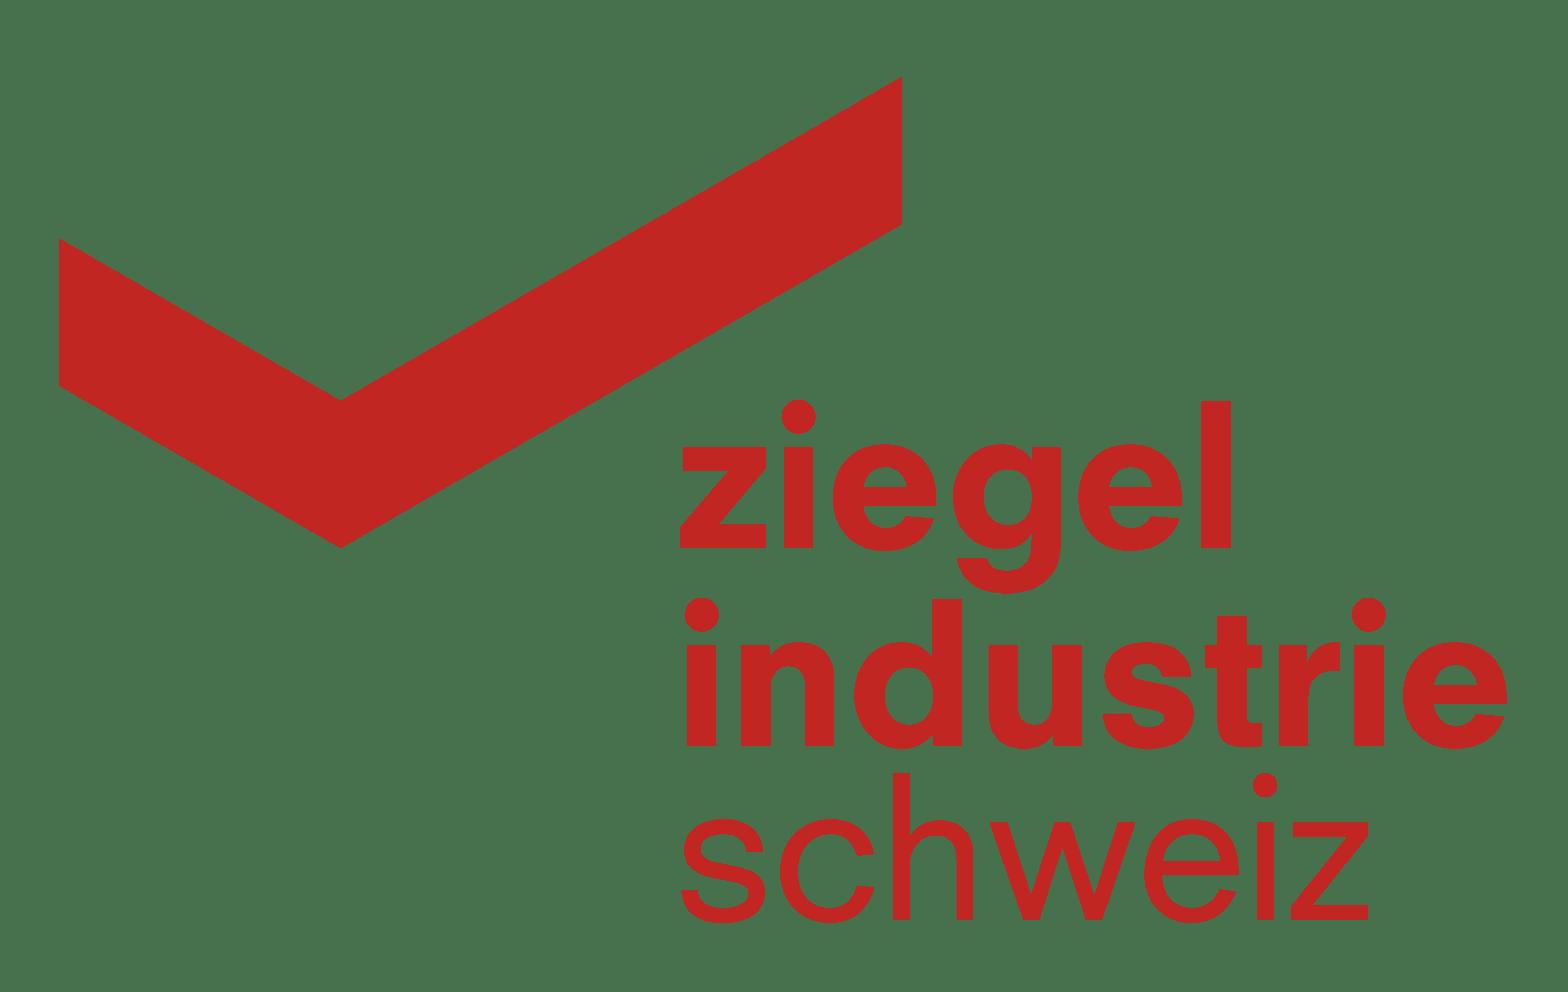 logo ziegel industrie schweiz